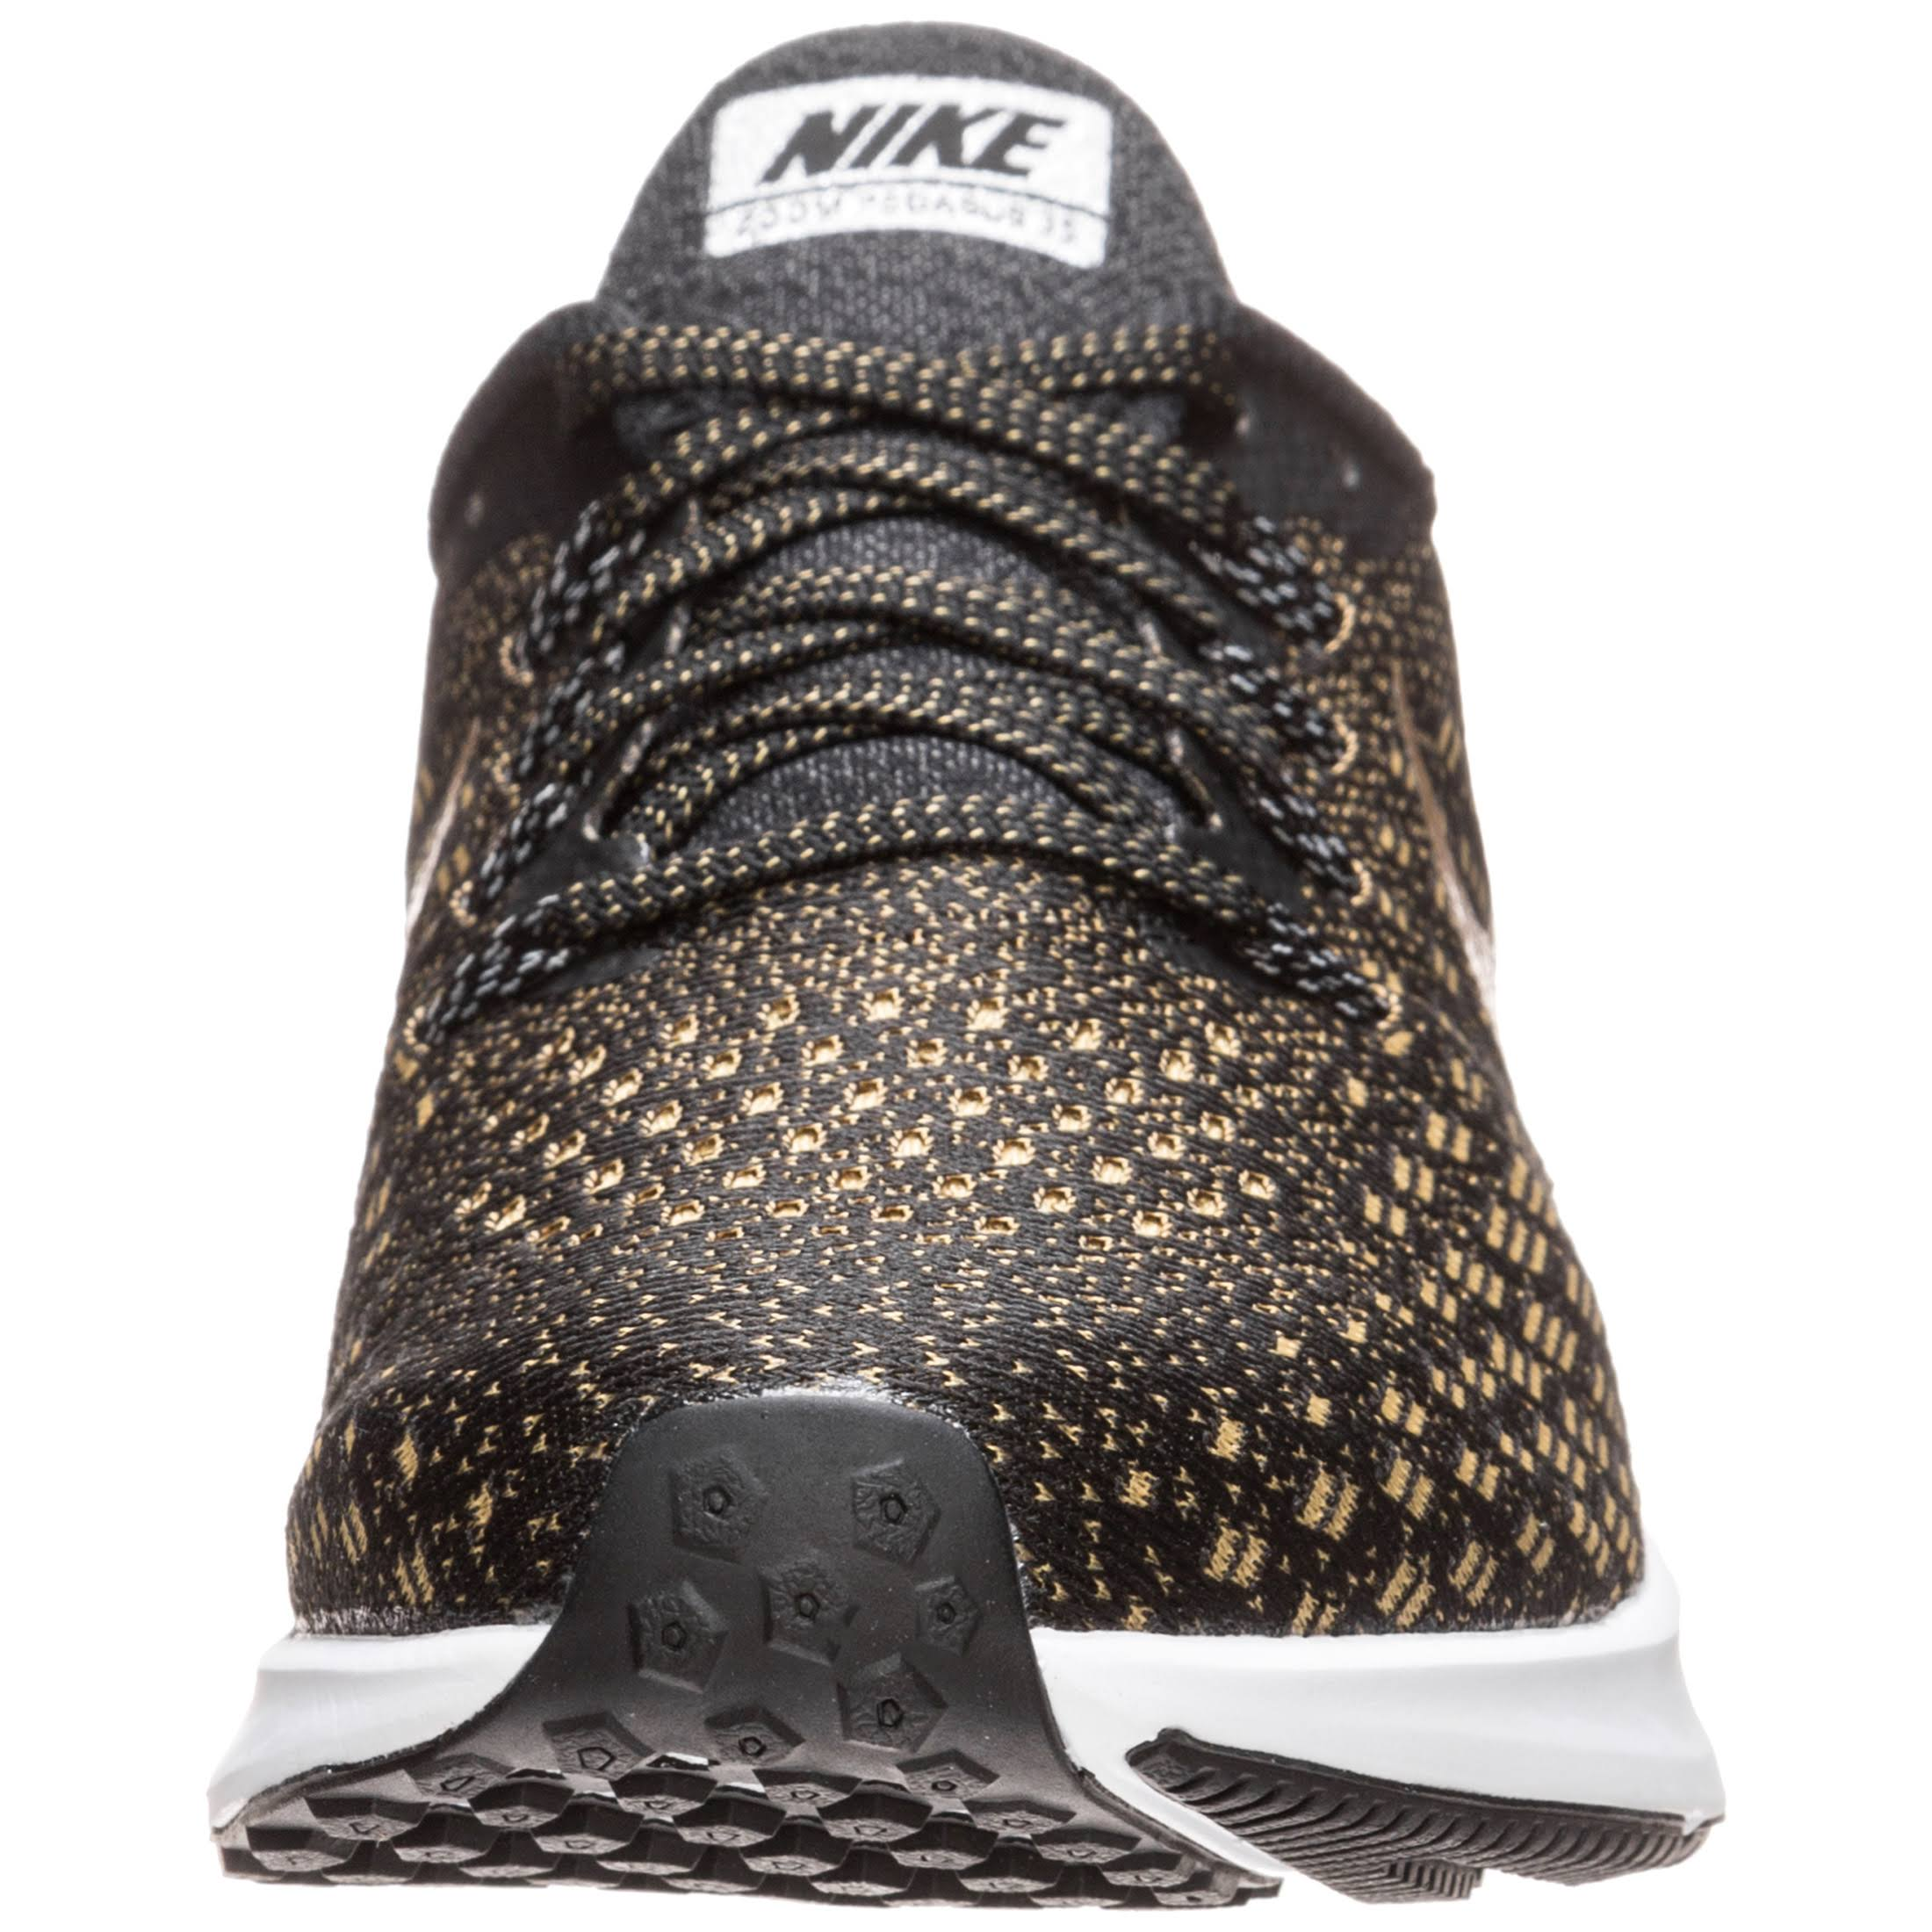 Nike Damen Zoom 35' Pegasus 'air Laufschuh Gold Schwarz 8HnWTHx